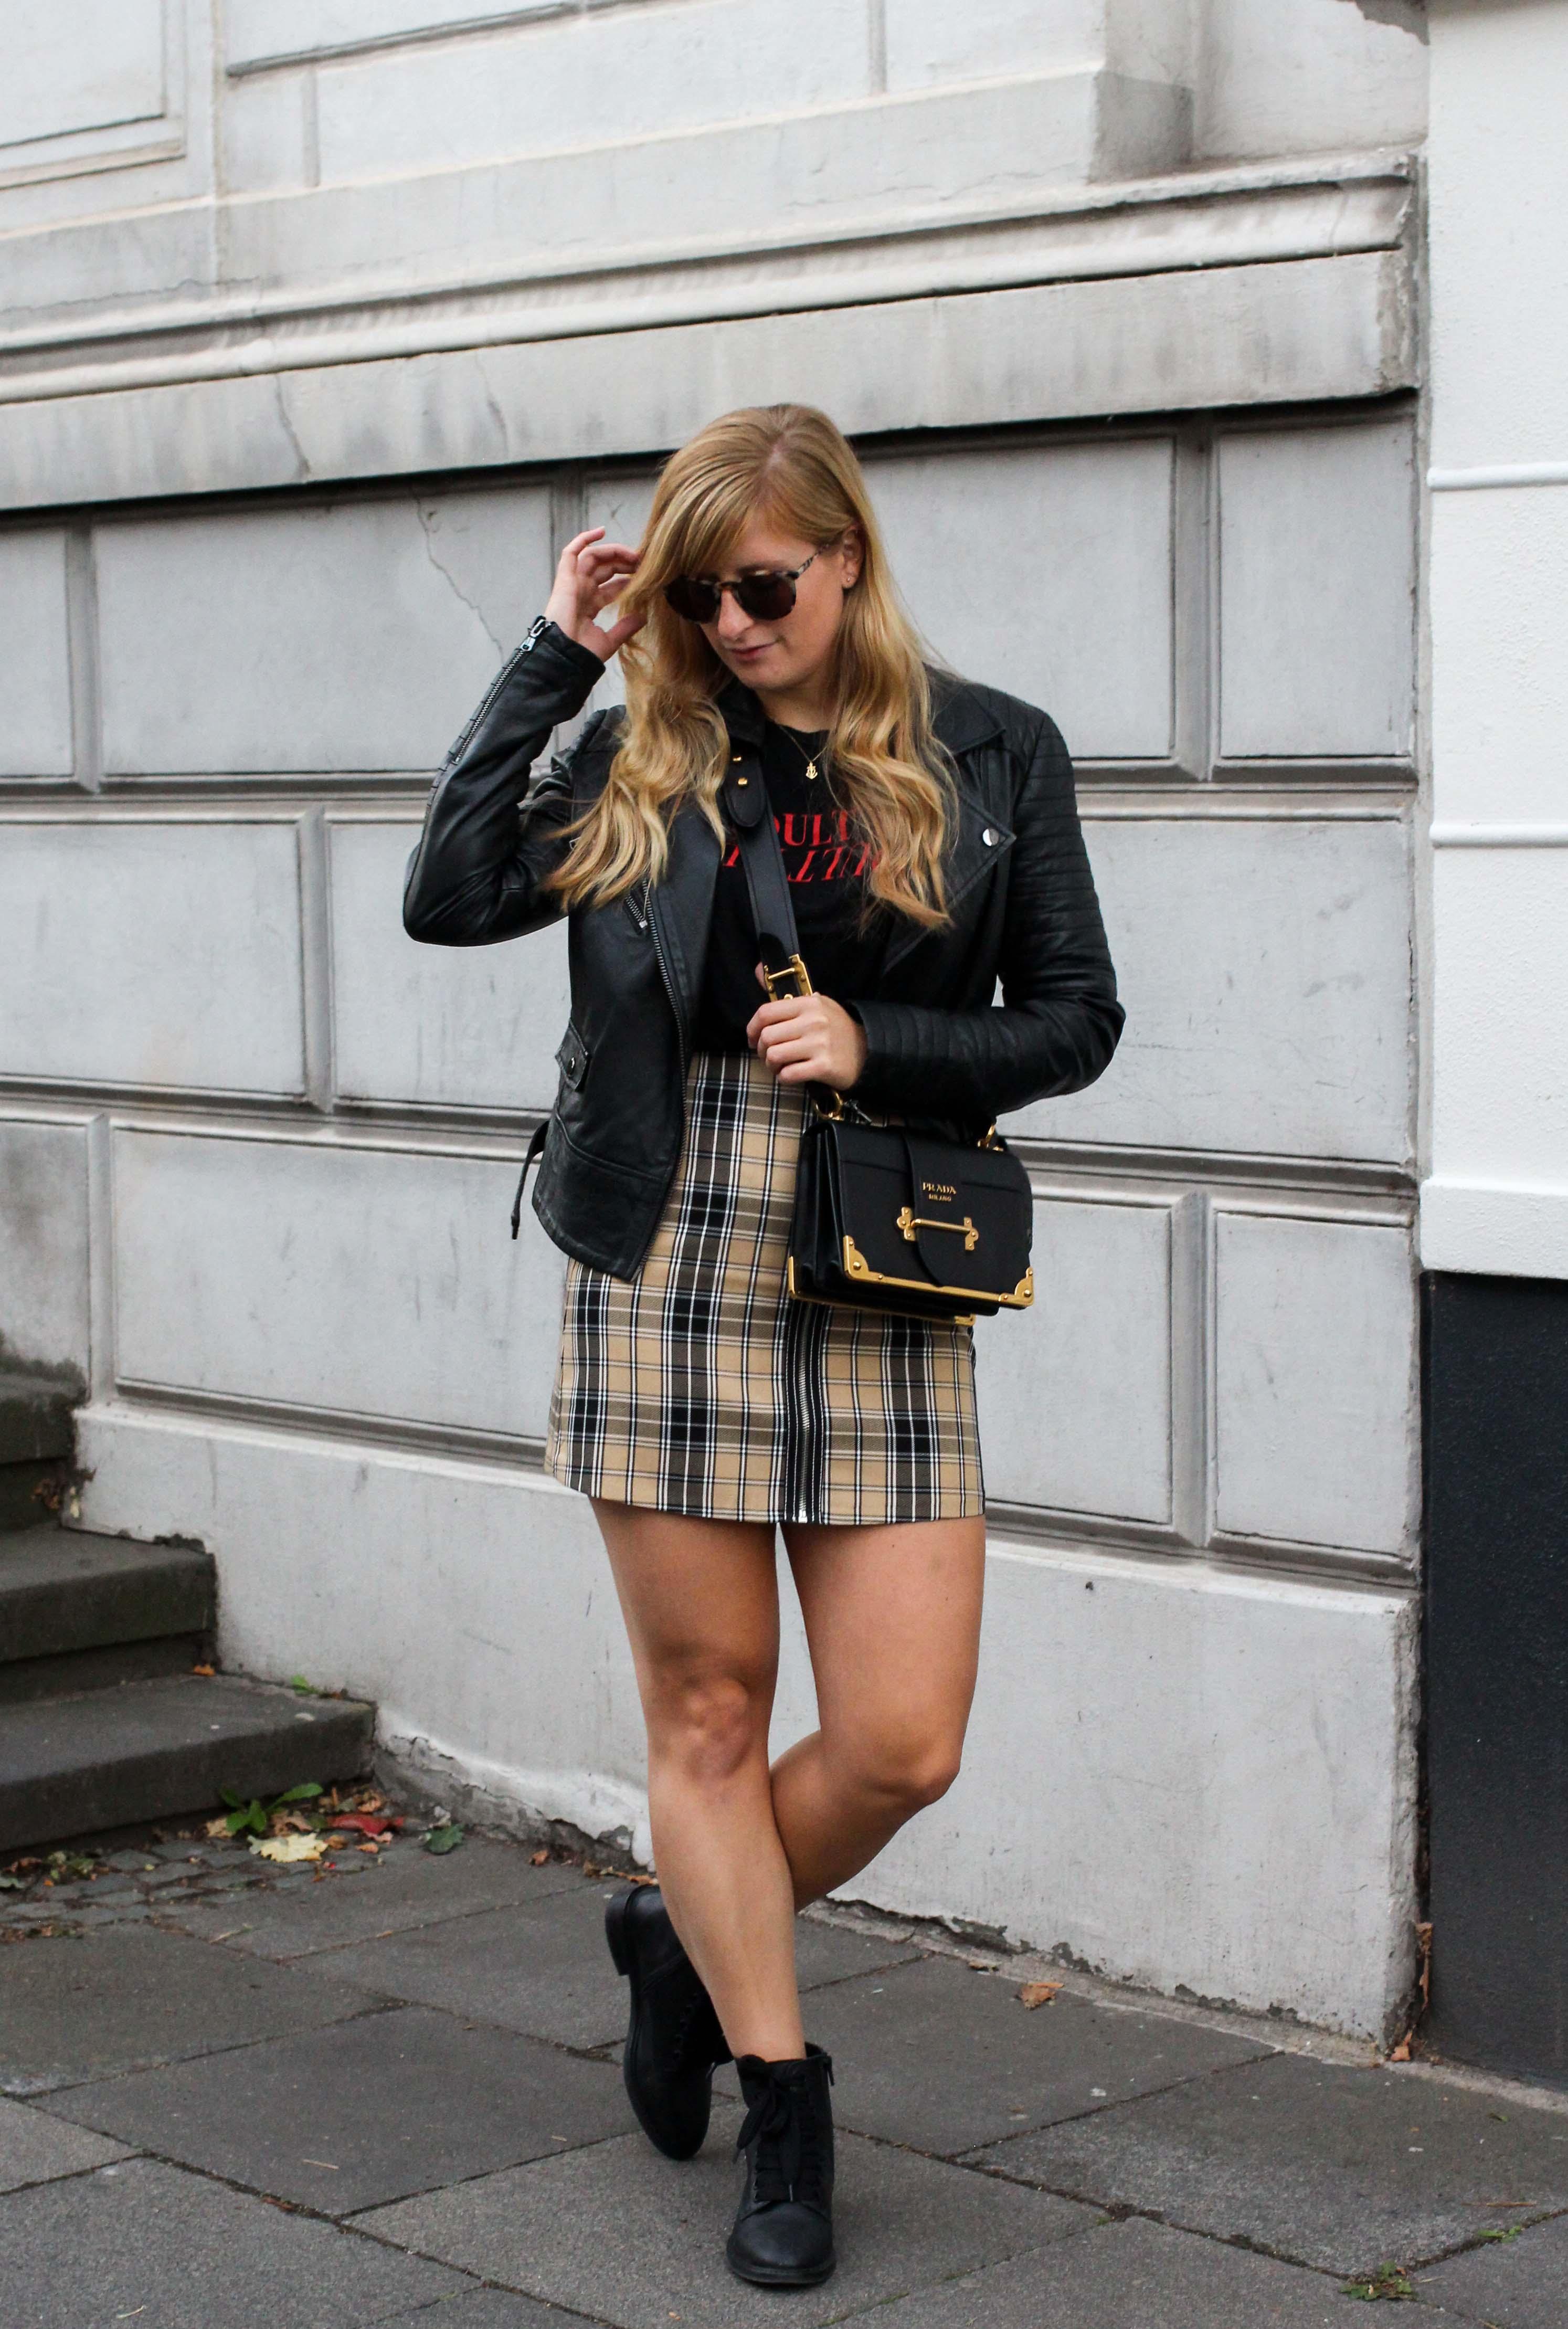 Outfit Karorock kombinieren Lederjacke Schleifenboots Übergangslook Modeblog Prada Cahier Tasche schwarz Bonn 8